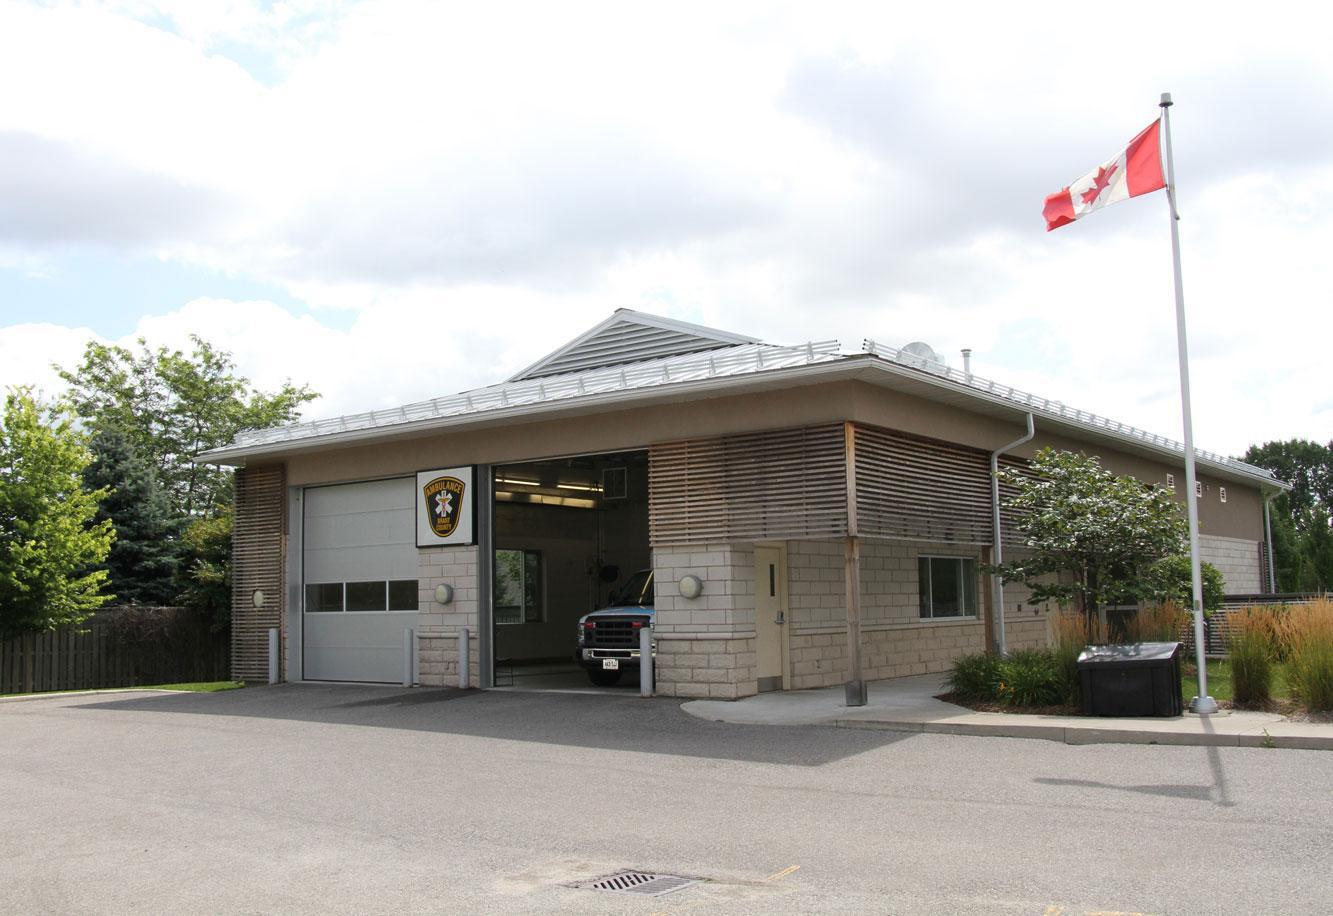 Tranquility Ambulance Station